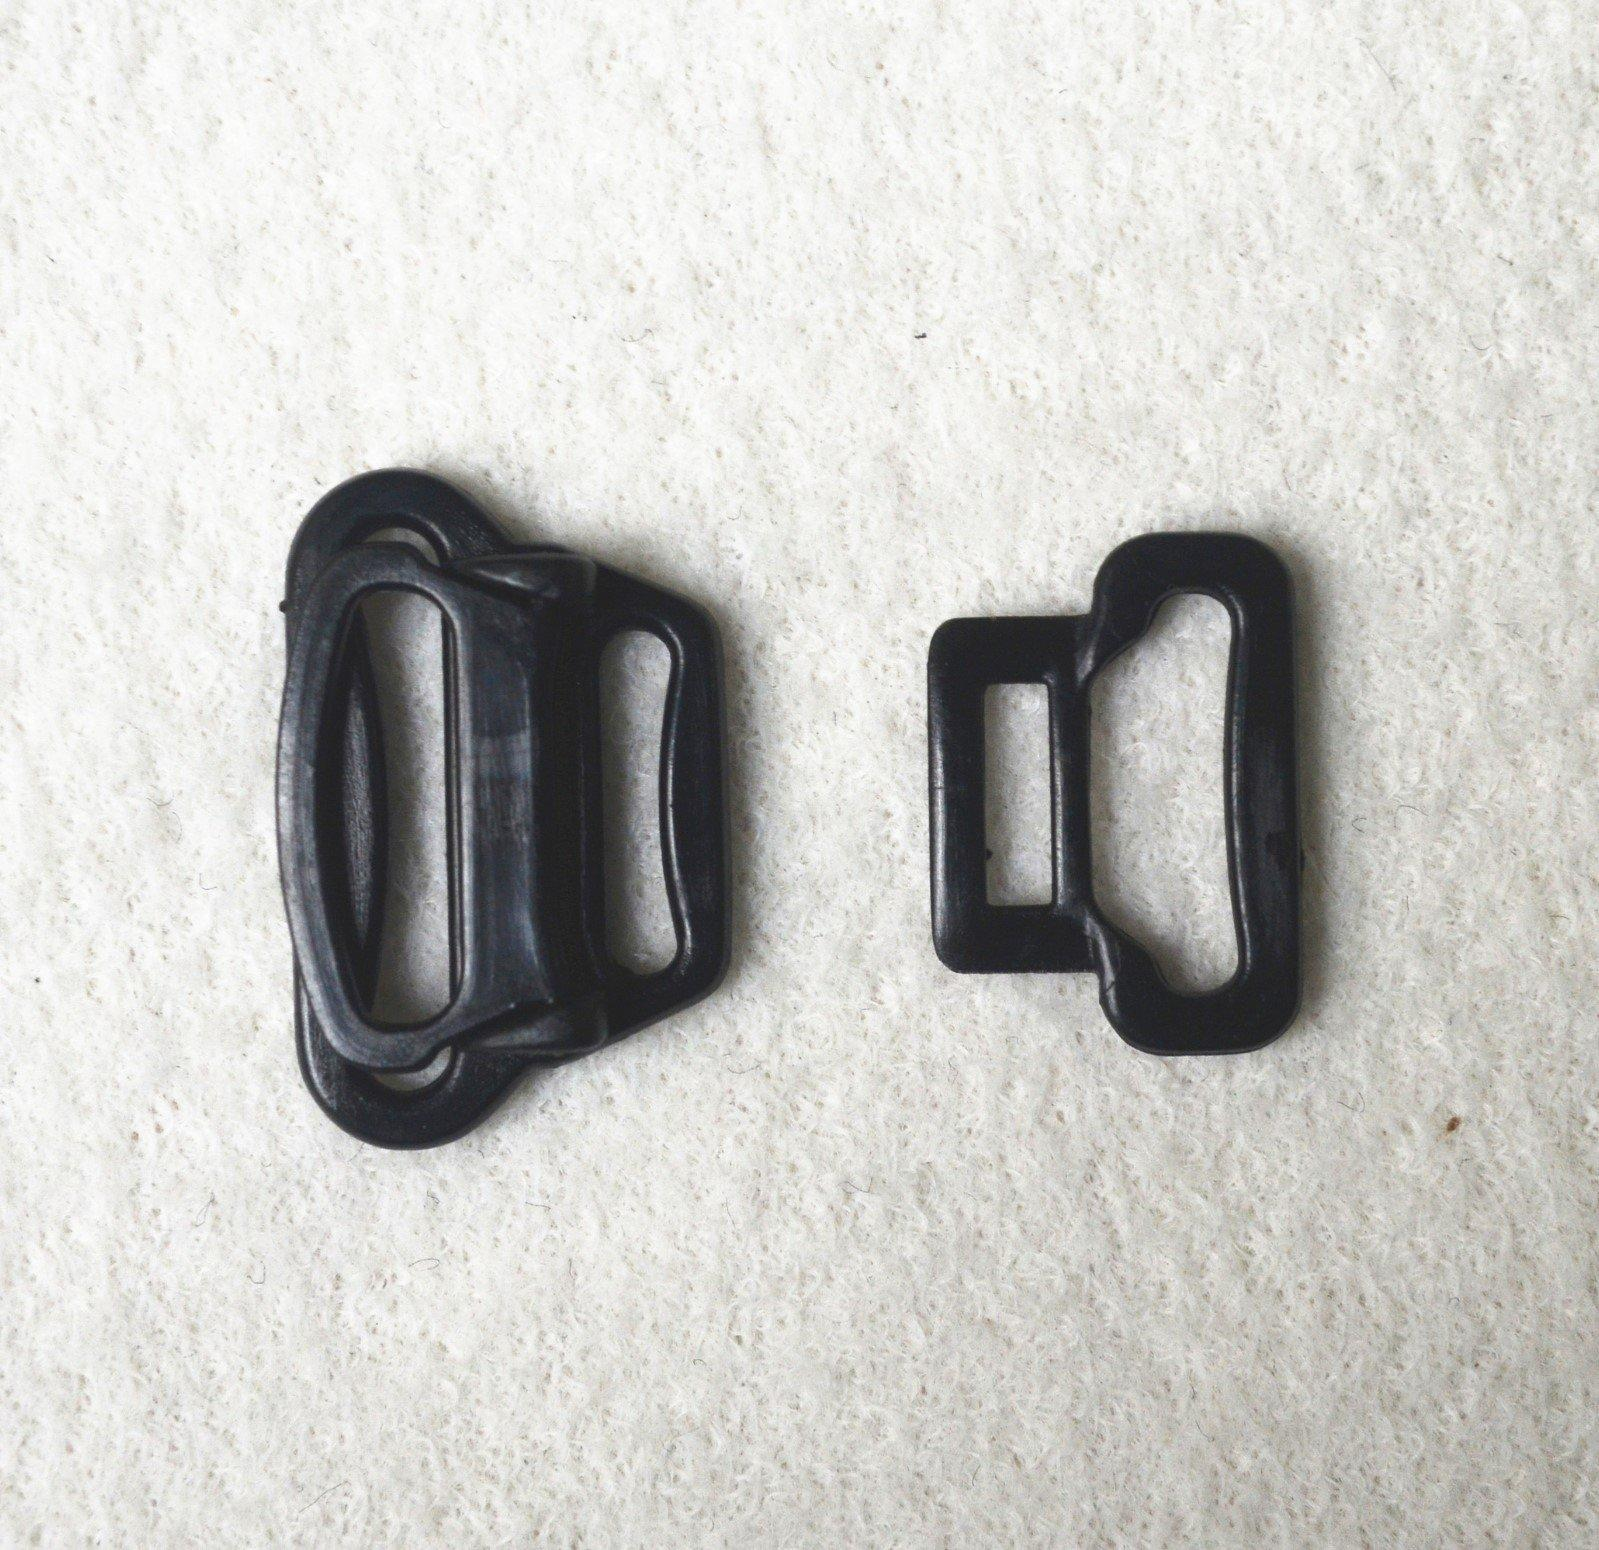 Mayrose-Plastic Adjuster Mommy Closure L20m2 - Mayrose Fastener-1